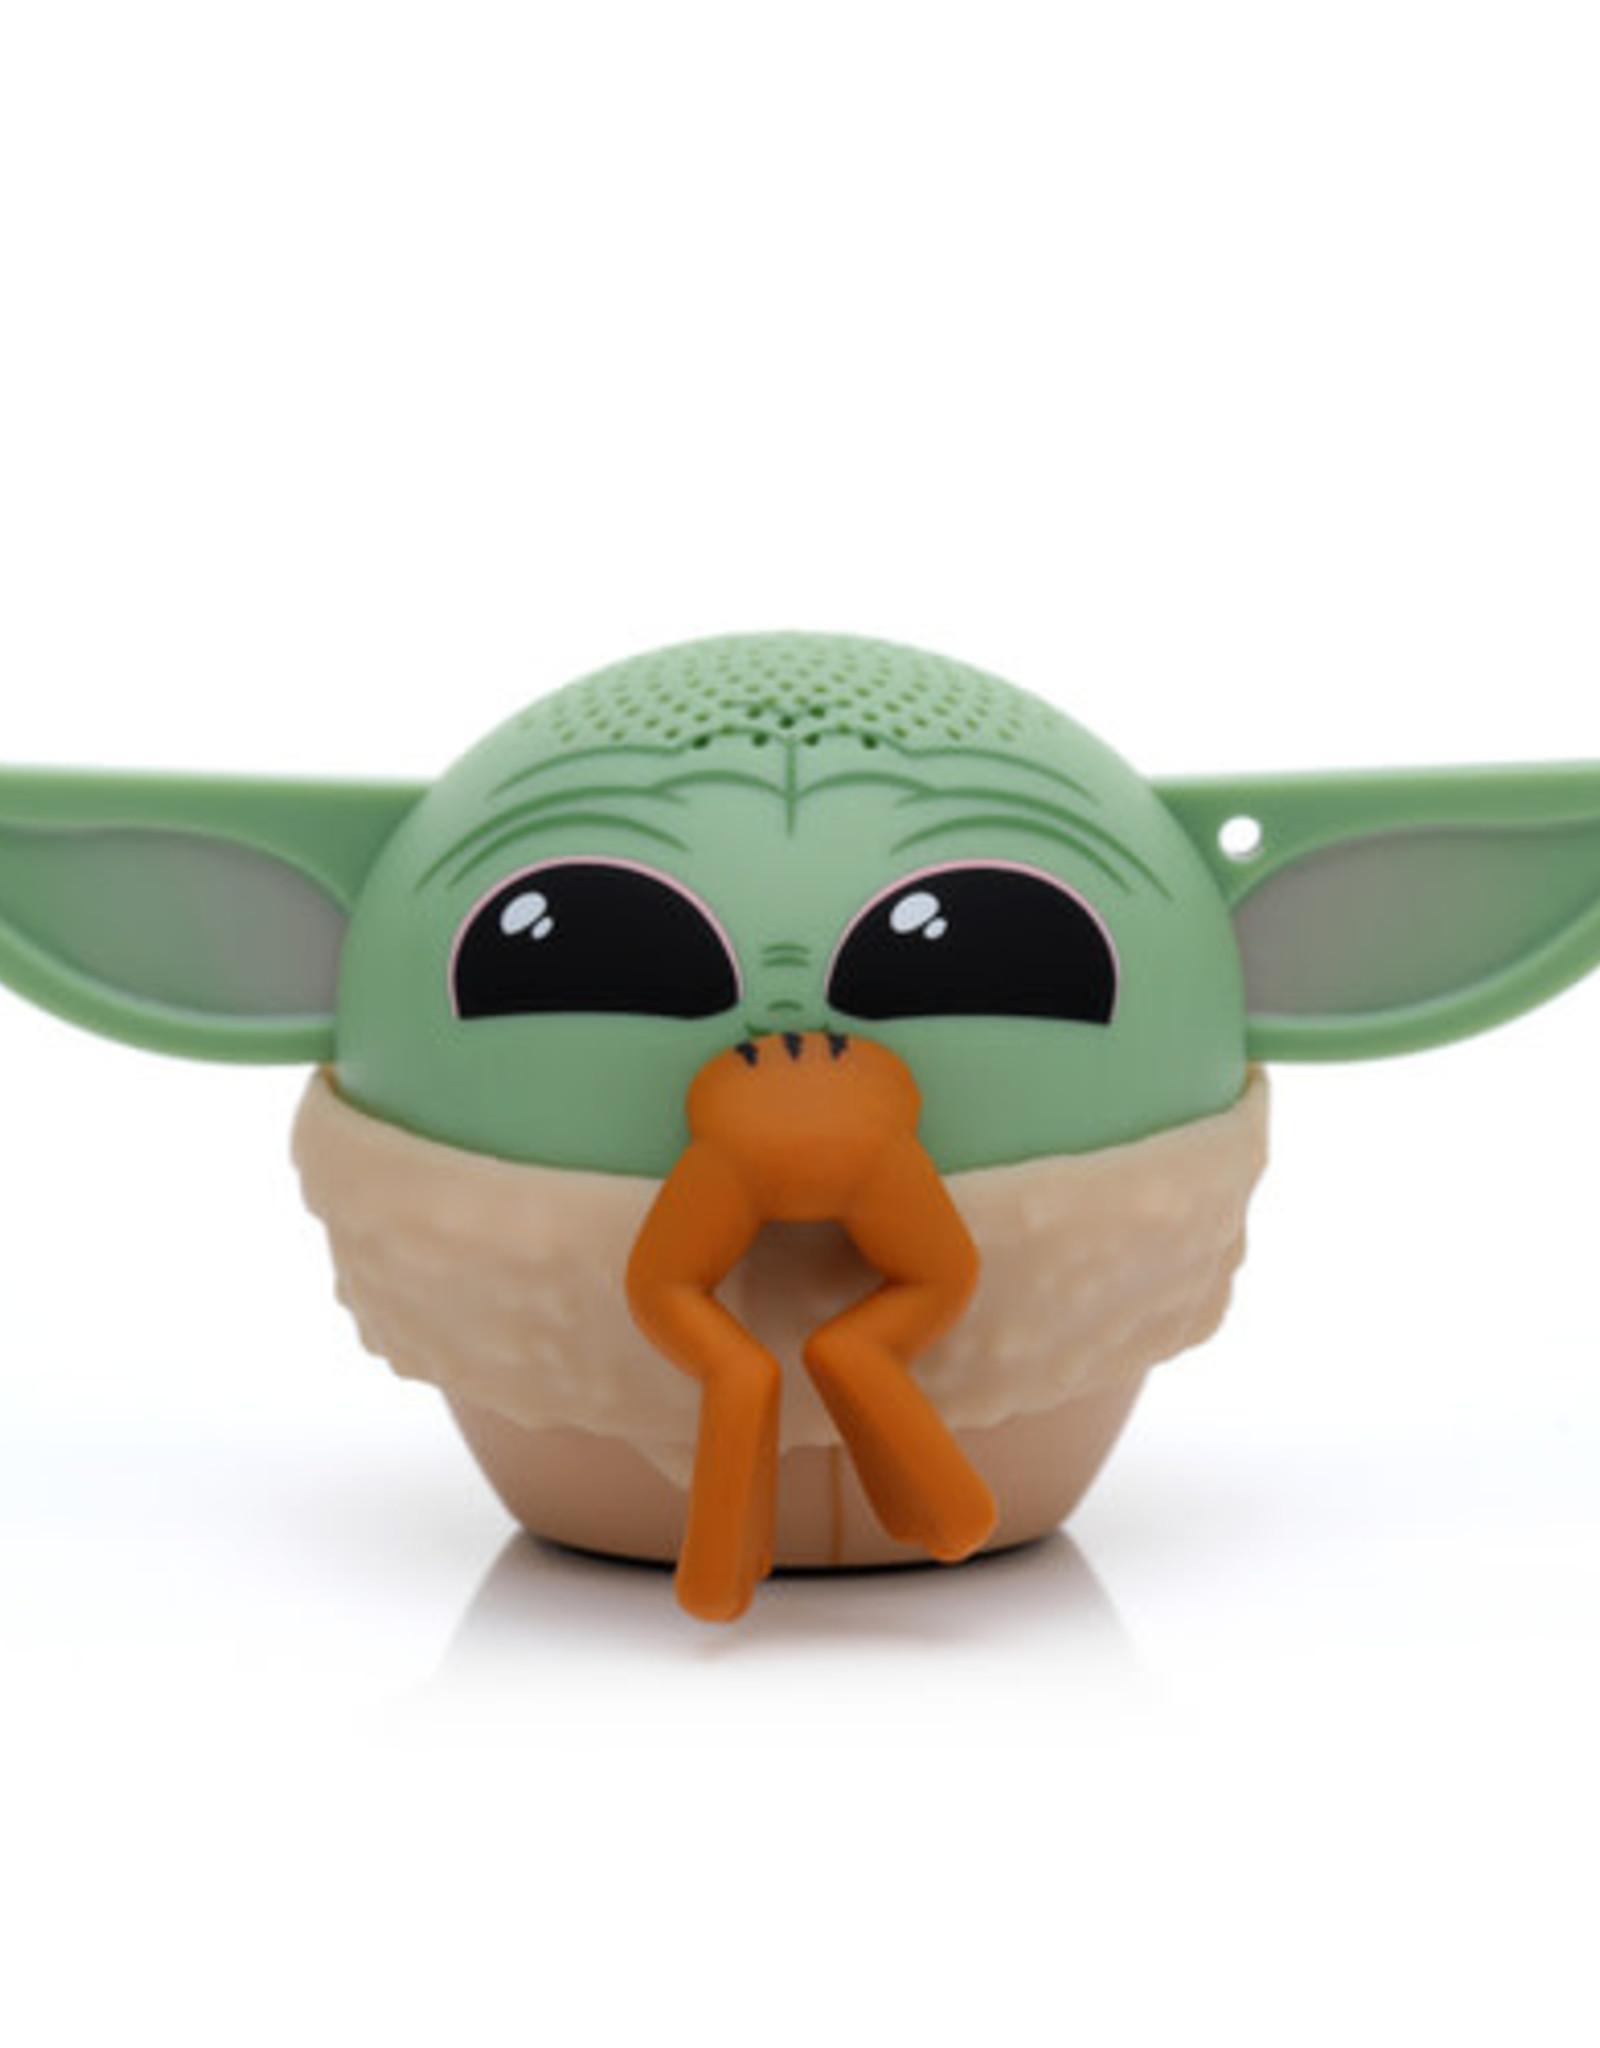 Star Wars Grogu/Baby Yoda Eating Bluetooth Speaker